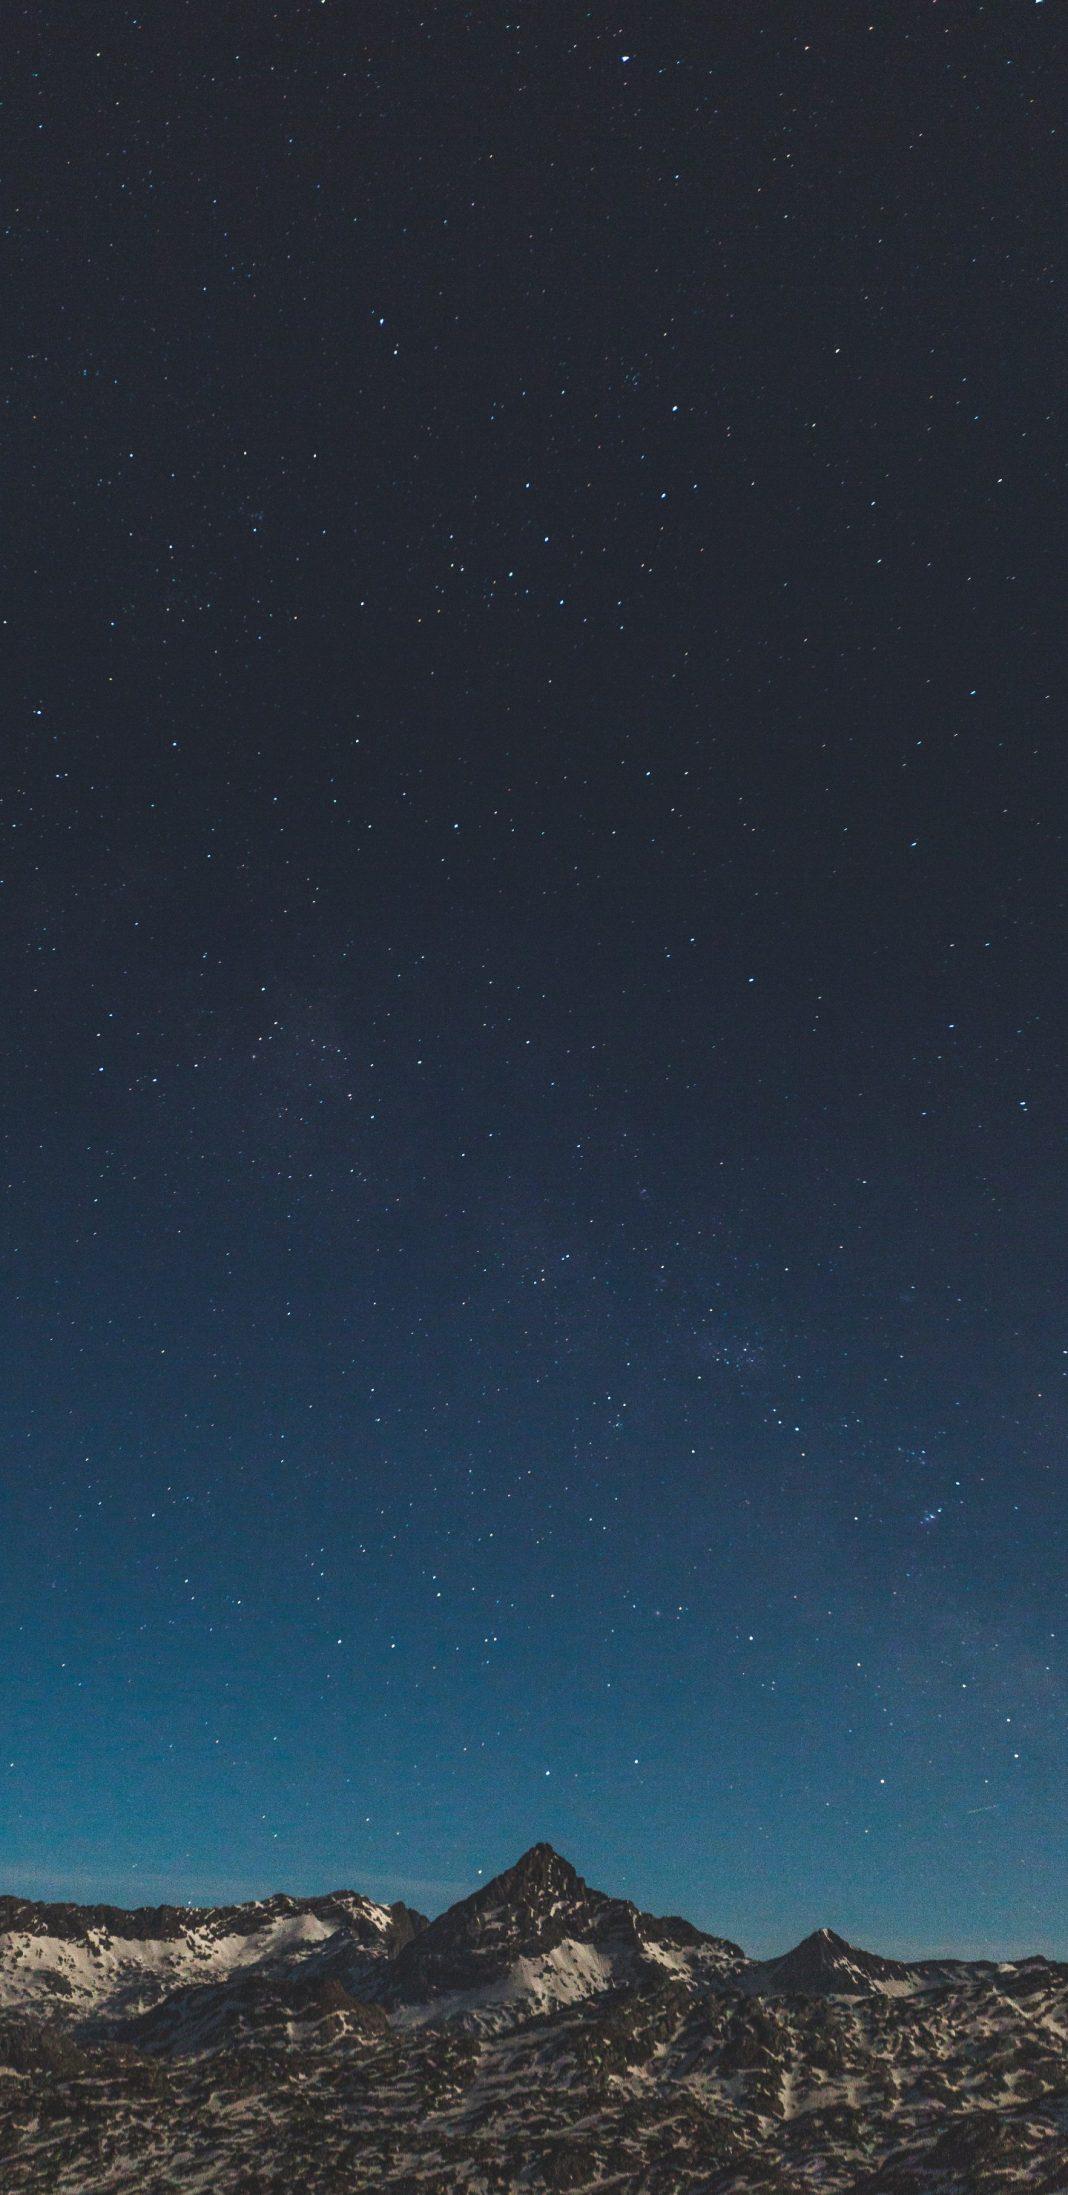 Samsung Galaxy S8 Wallpaper Official